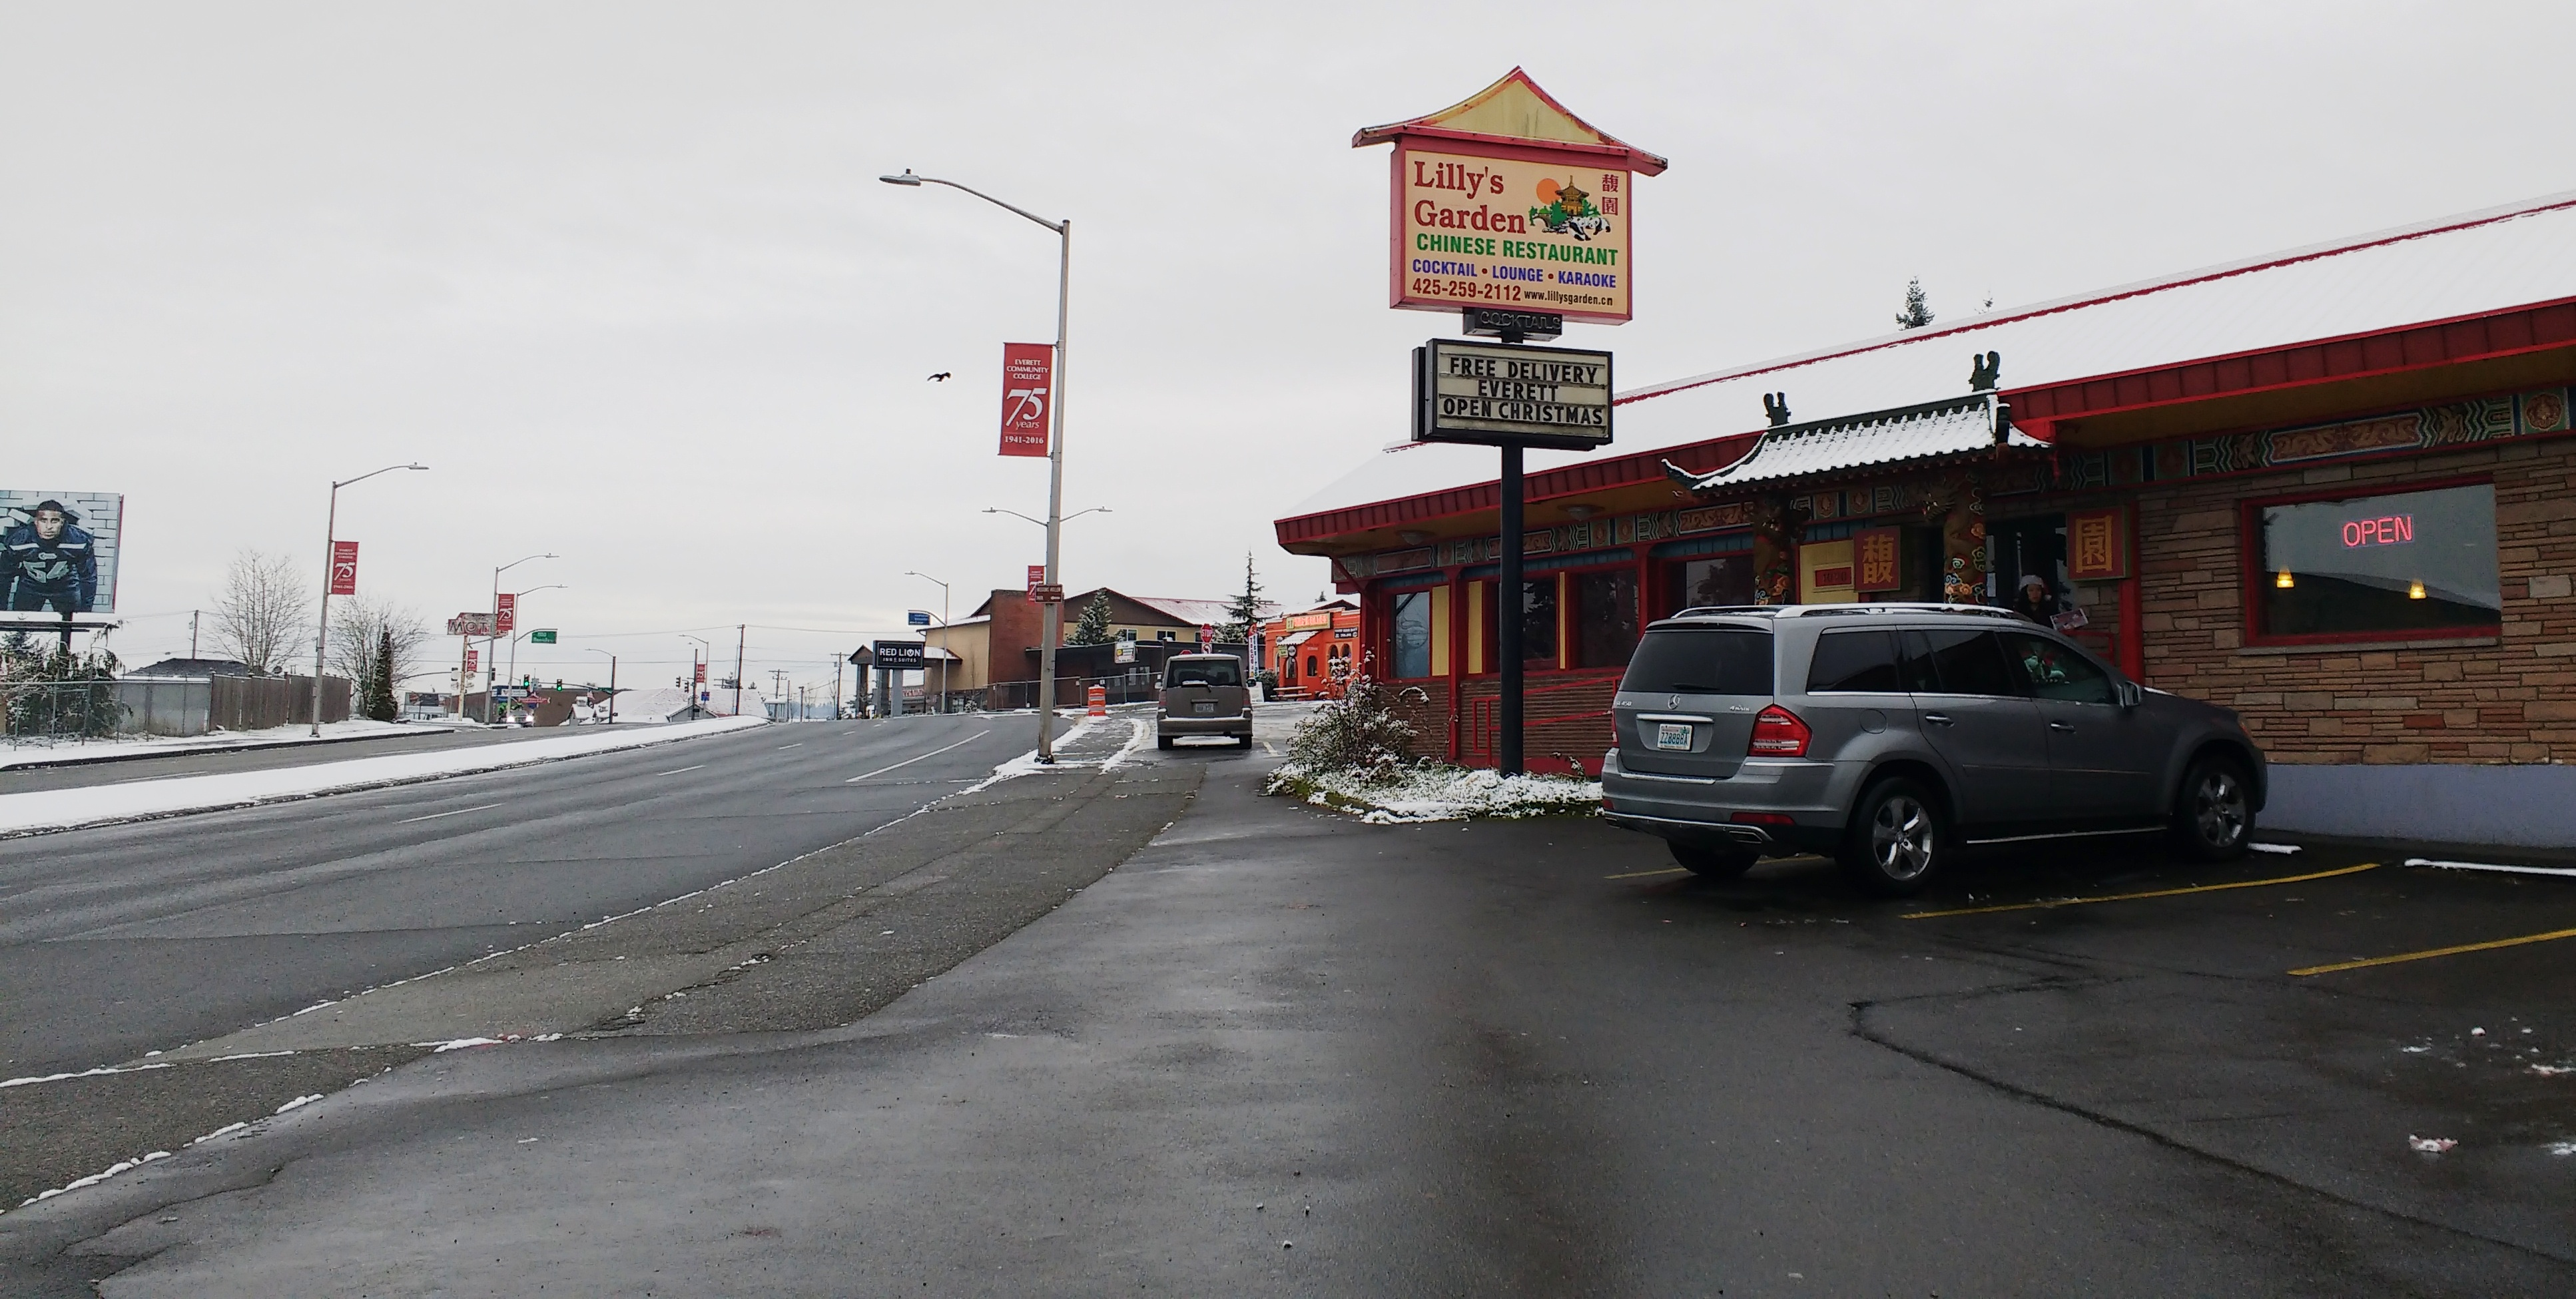 Christmas Day Road, Retail, Restaurant Update | MYEVERETTNEWS.com